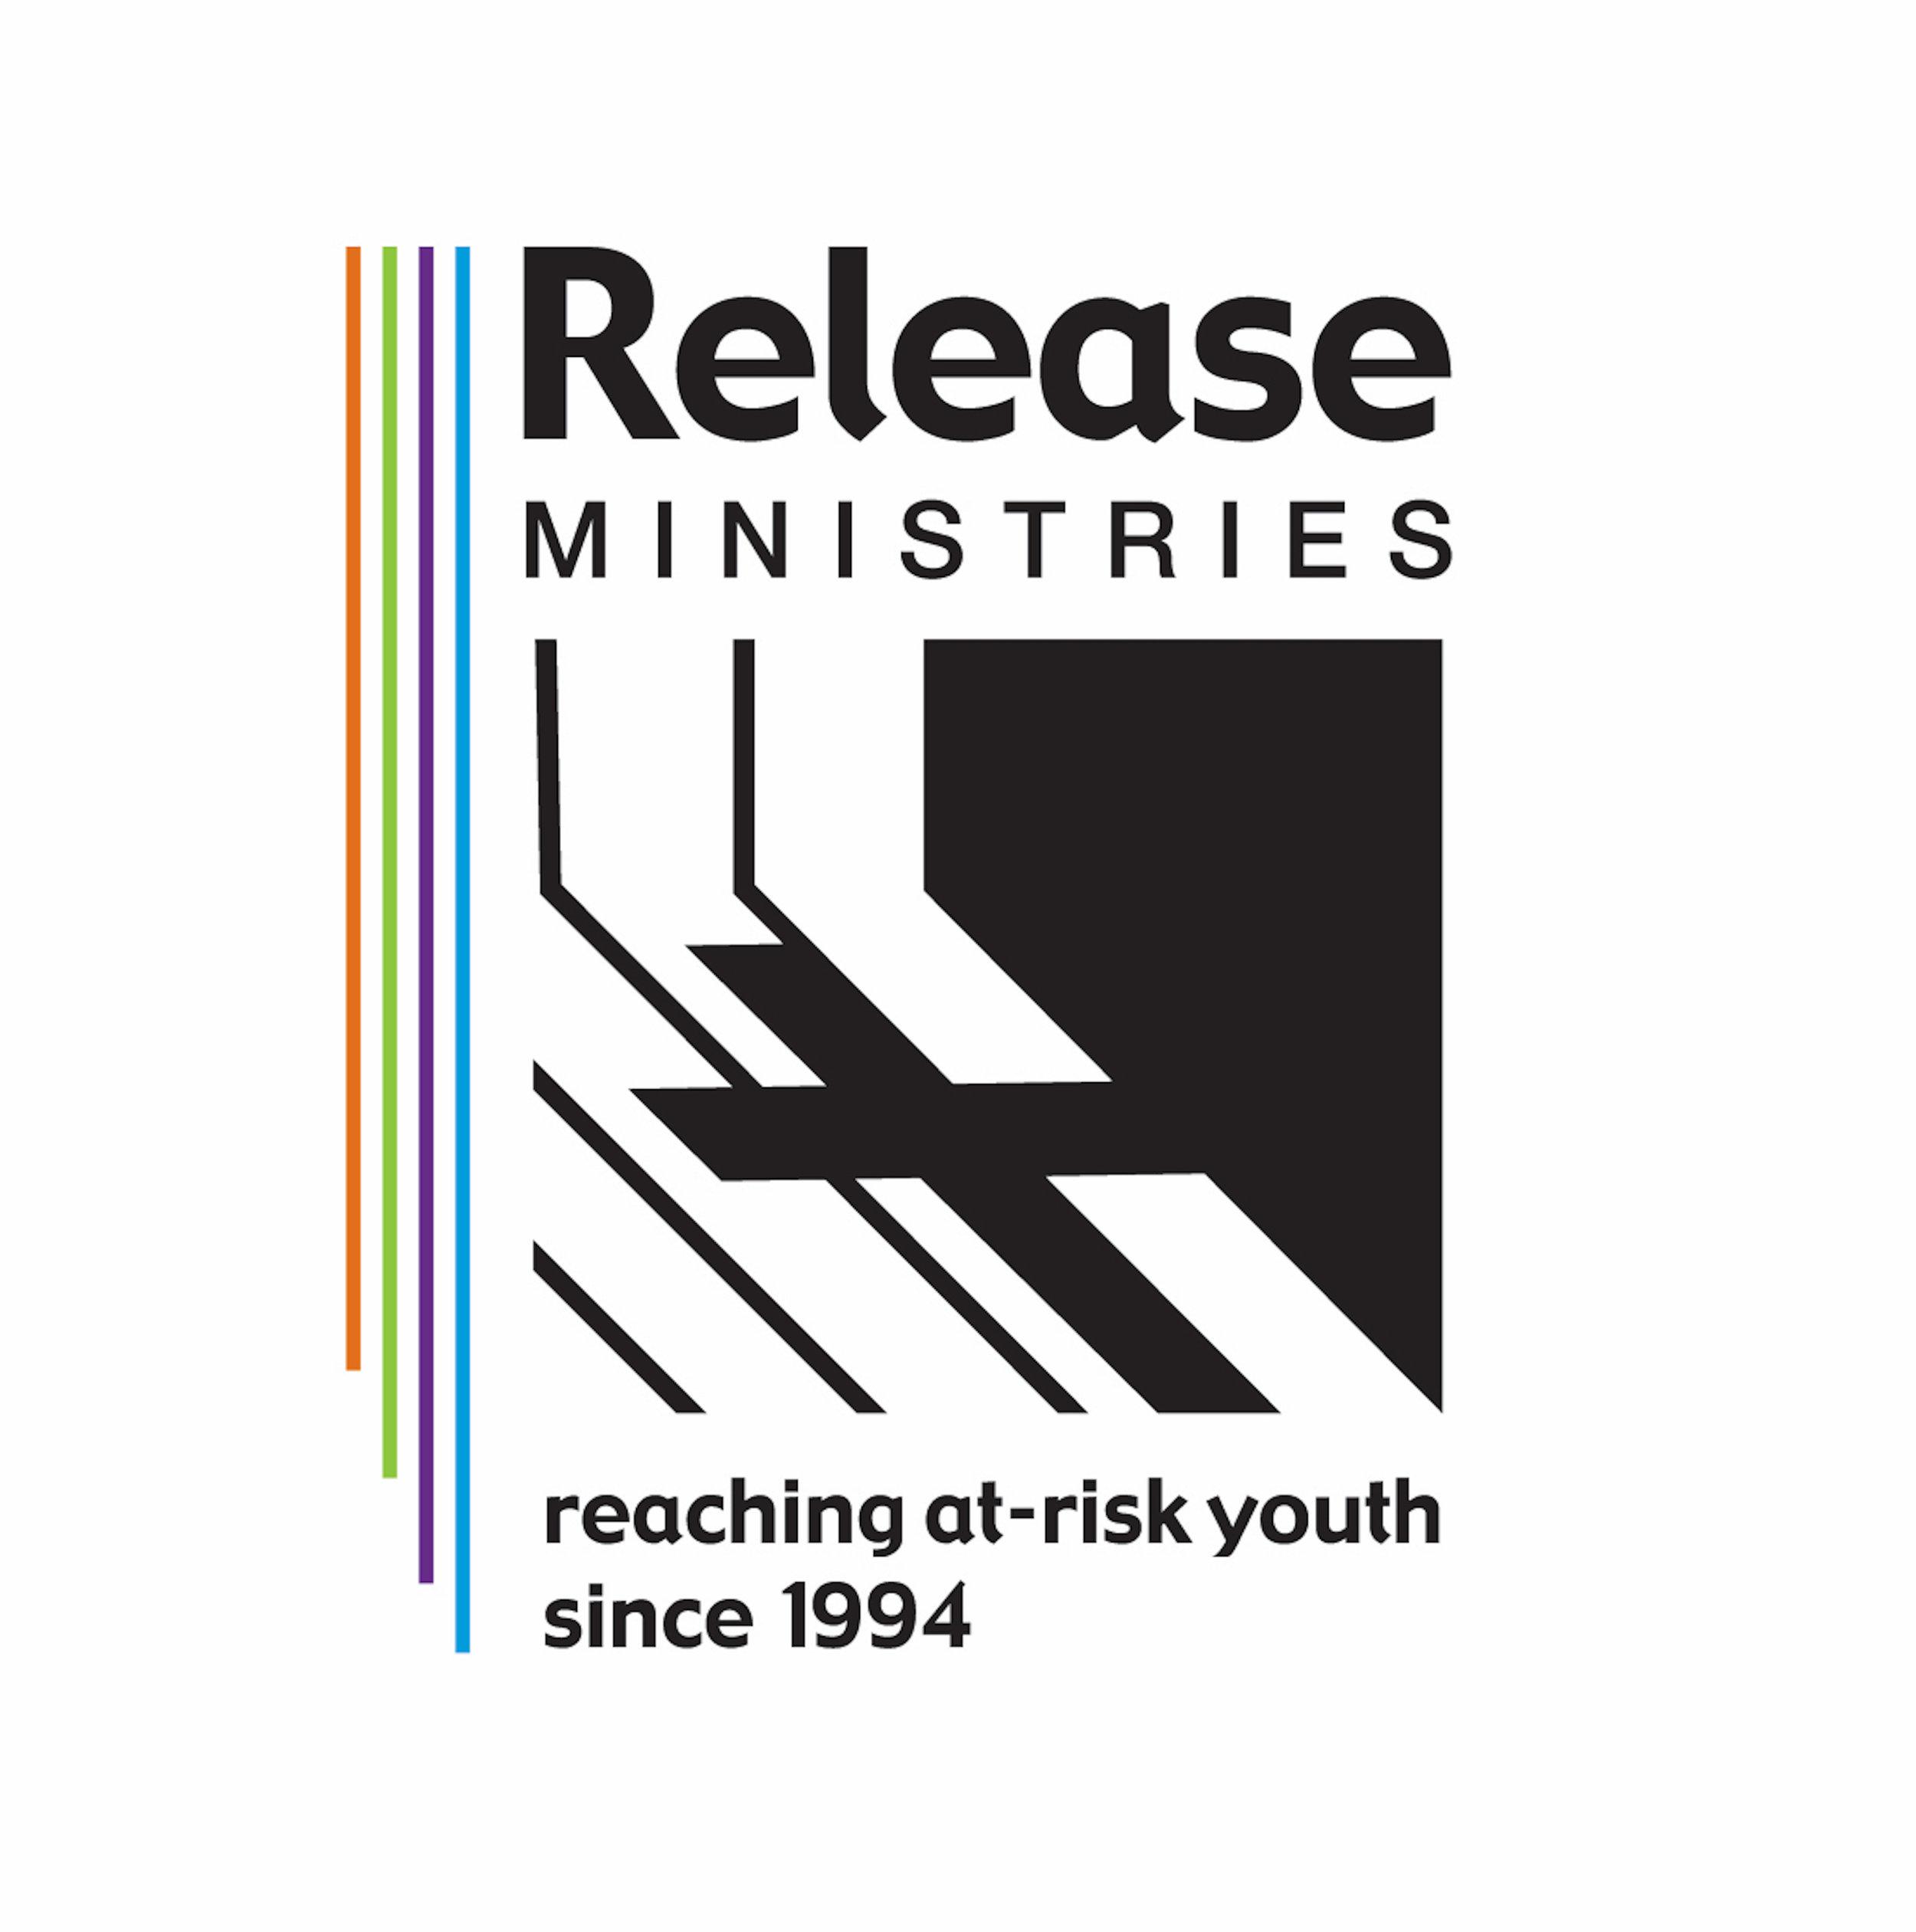 ReleaseMinistries_Logo.jpg